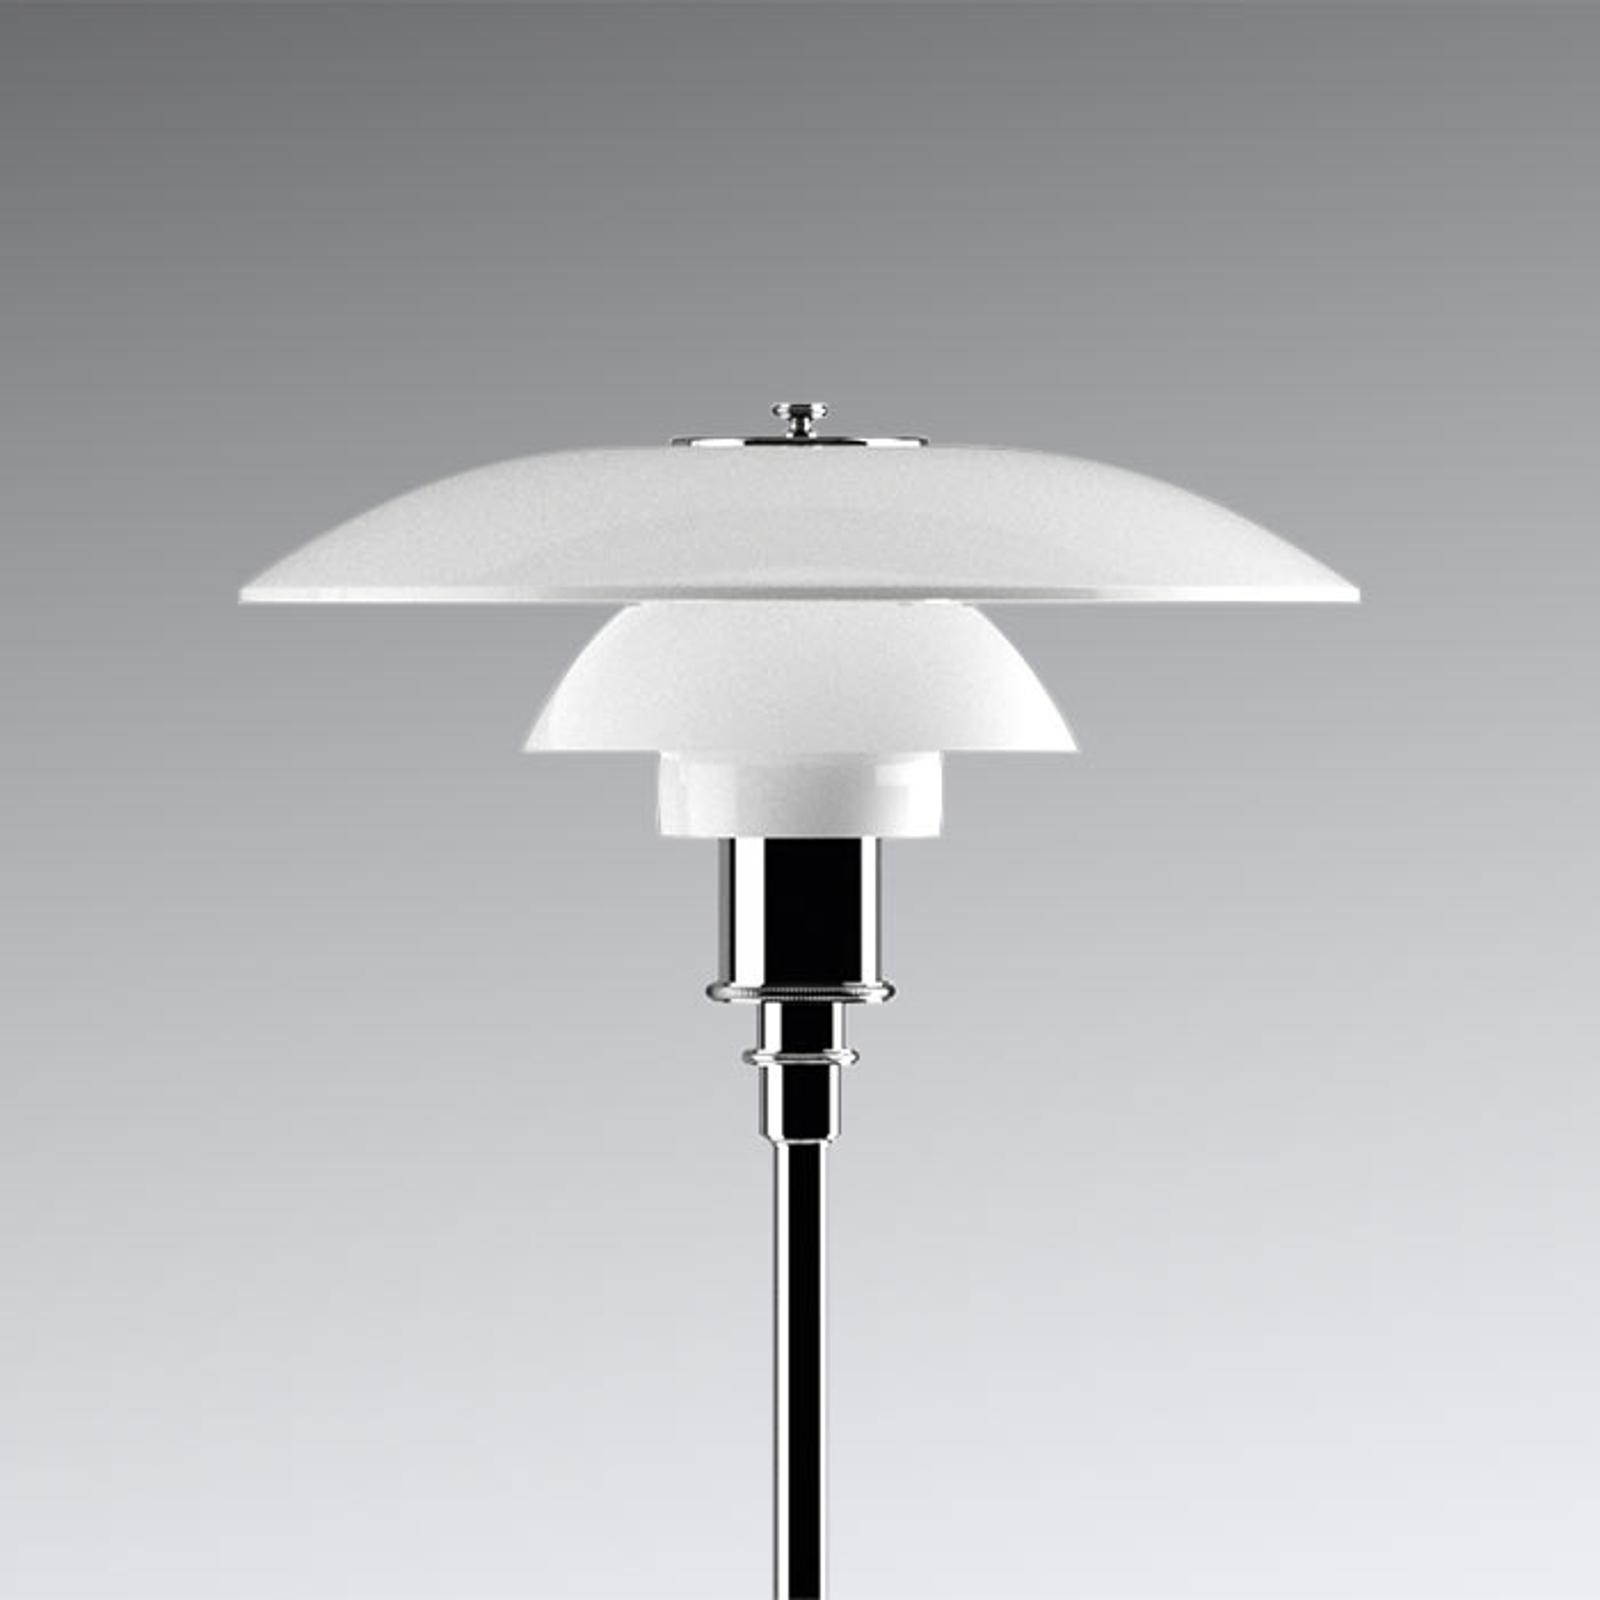 Louis Poulsen PH 3 1/2-2 1/2 Stehlampe verchromt